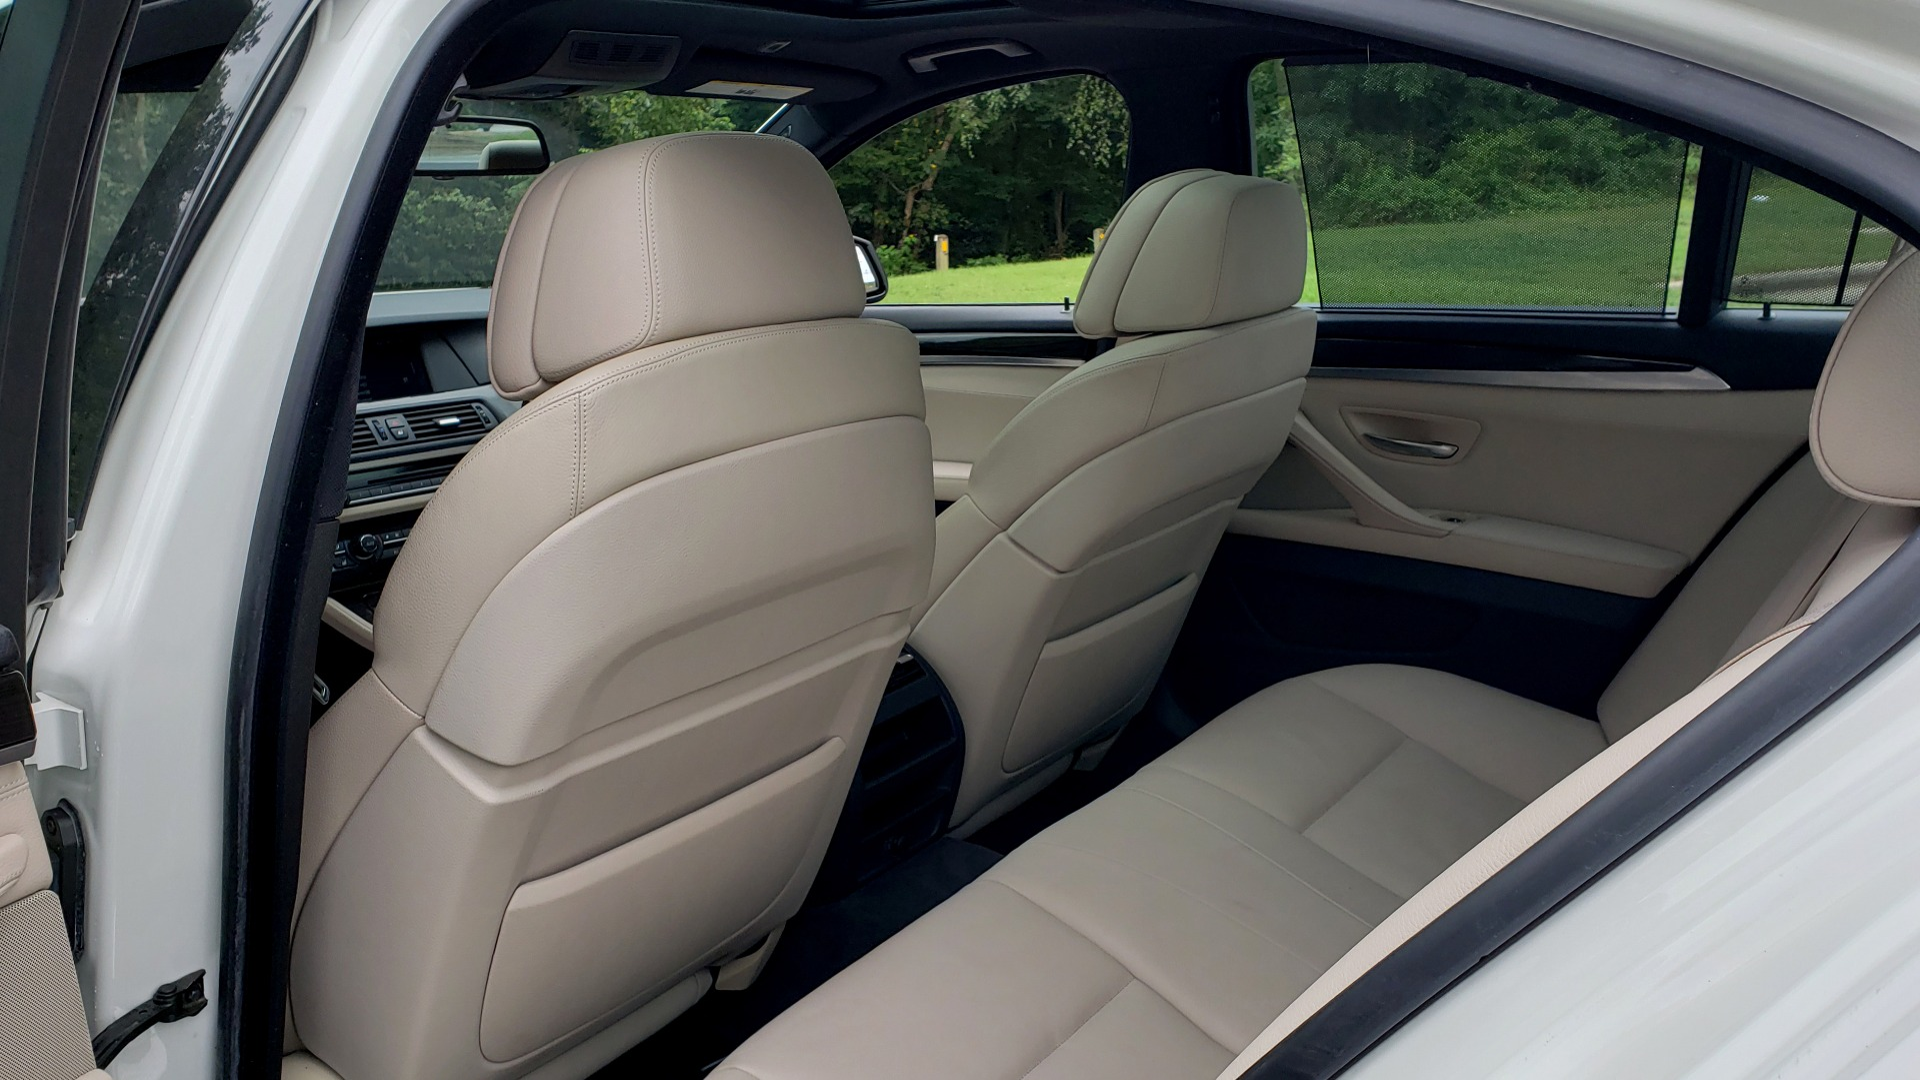 Used 2012 BMW 5 SERIES 550I M SPORT / NAV / CONV PKG / SUNROOF / PREM SND / REARVIEW for sale Sold at Formula Imports in Charlotte NC 28227 56